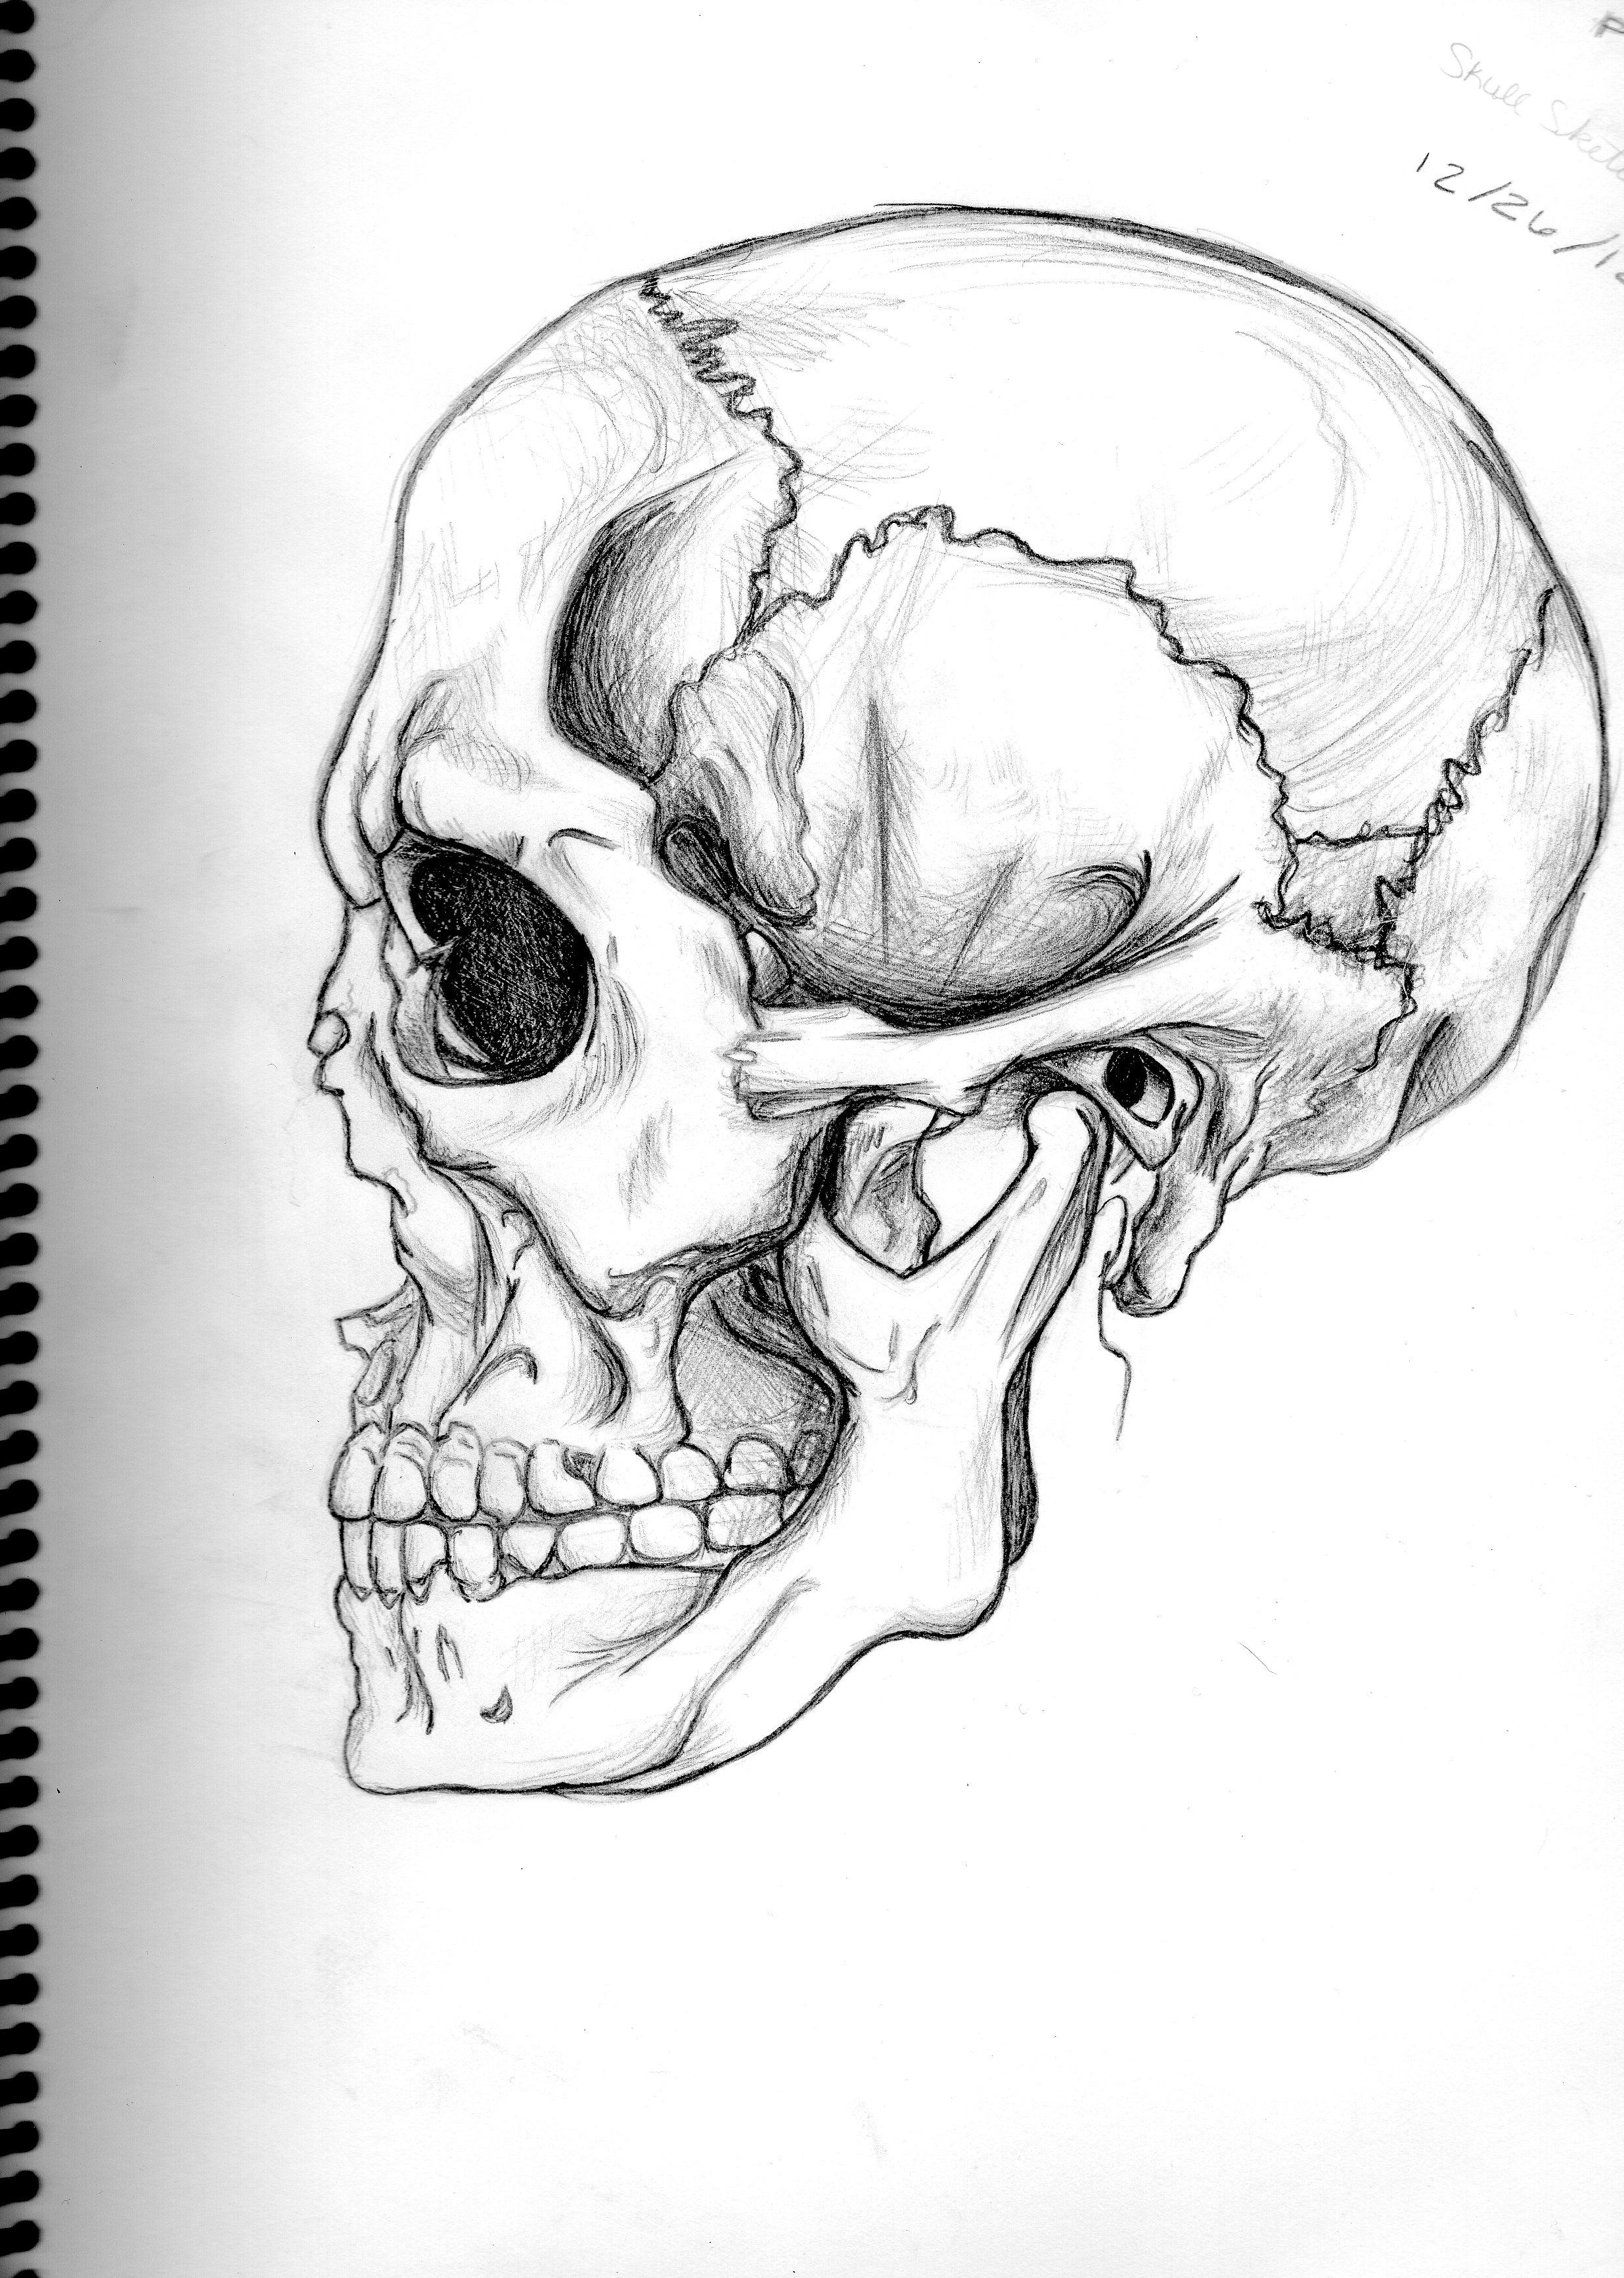 Dinosaur Skull Drawing at GetDrawings.com | Free for personal use ...